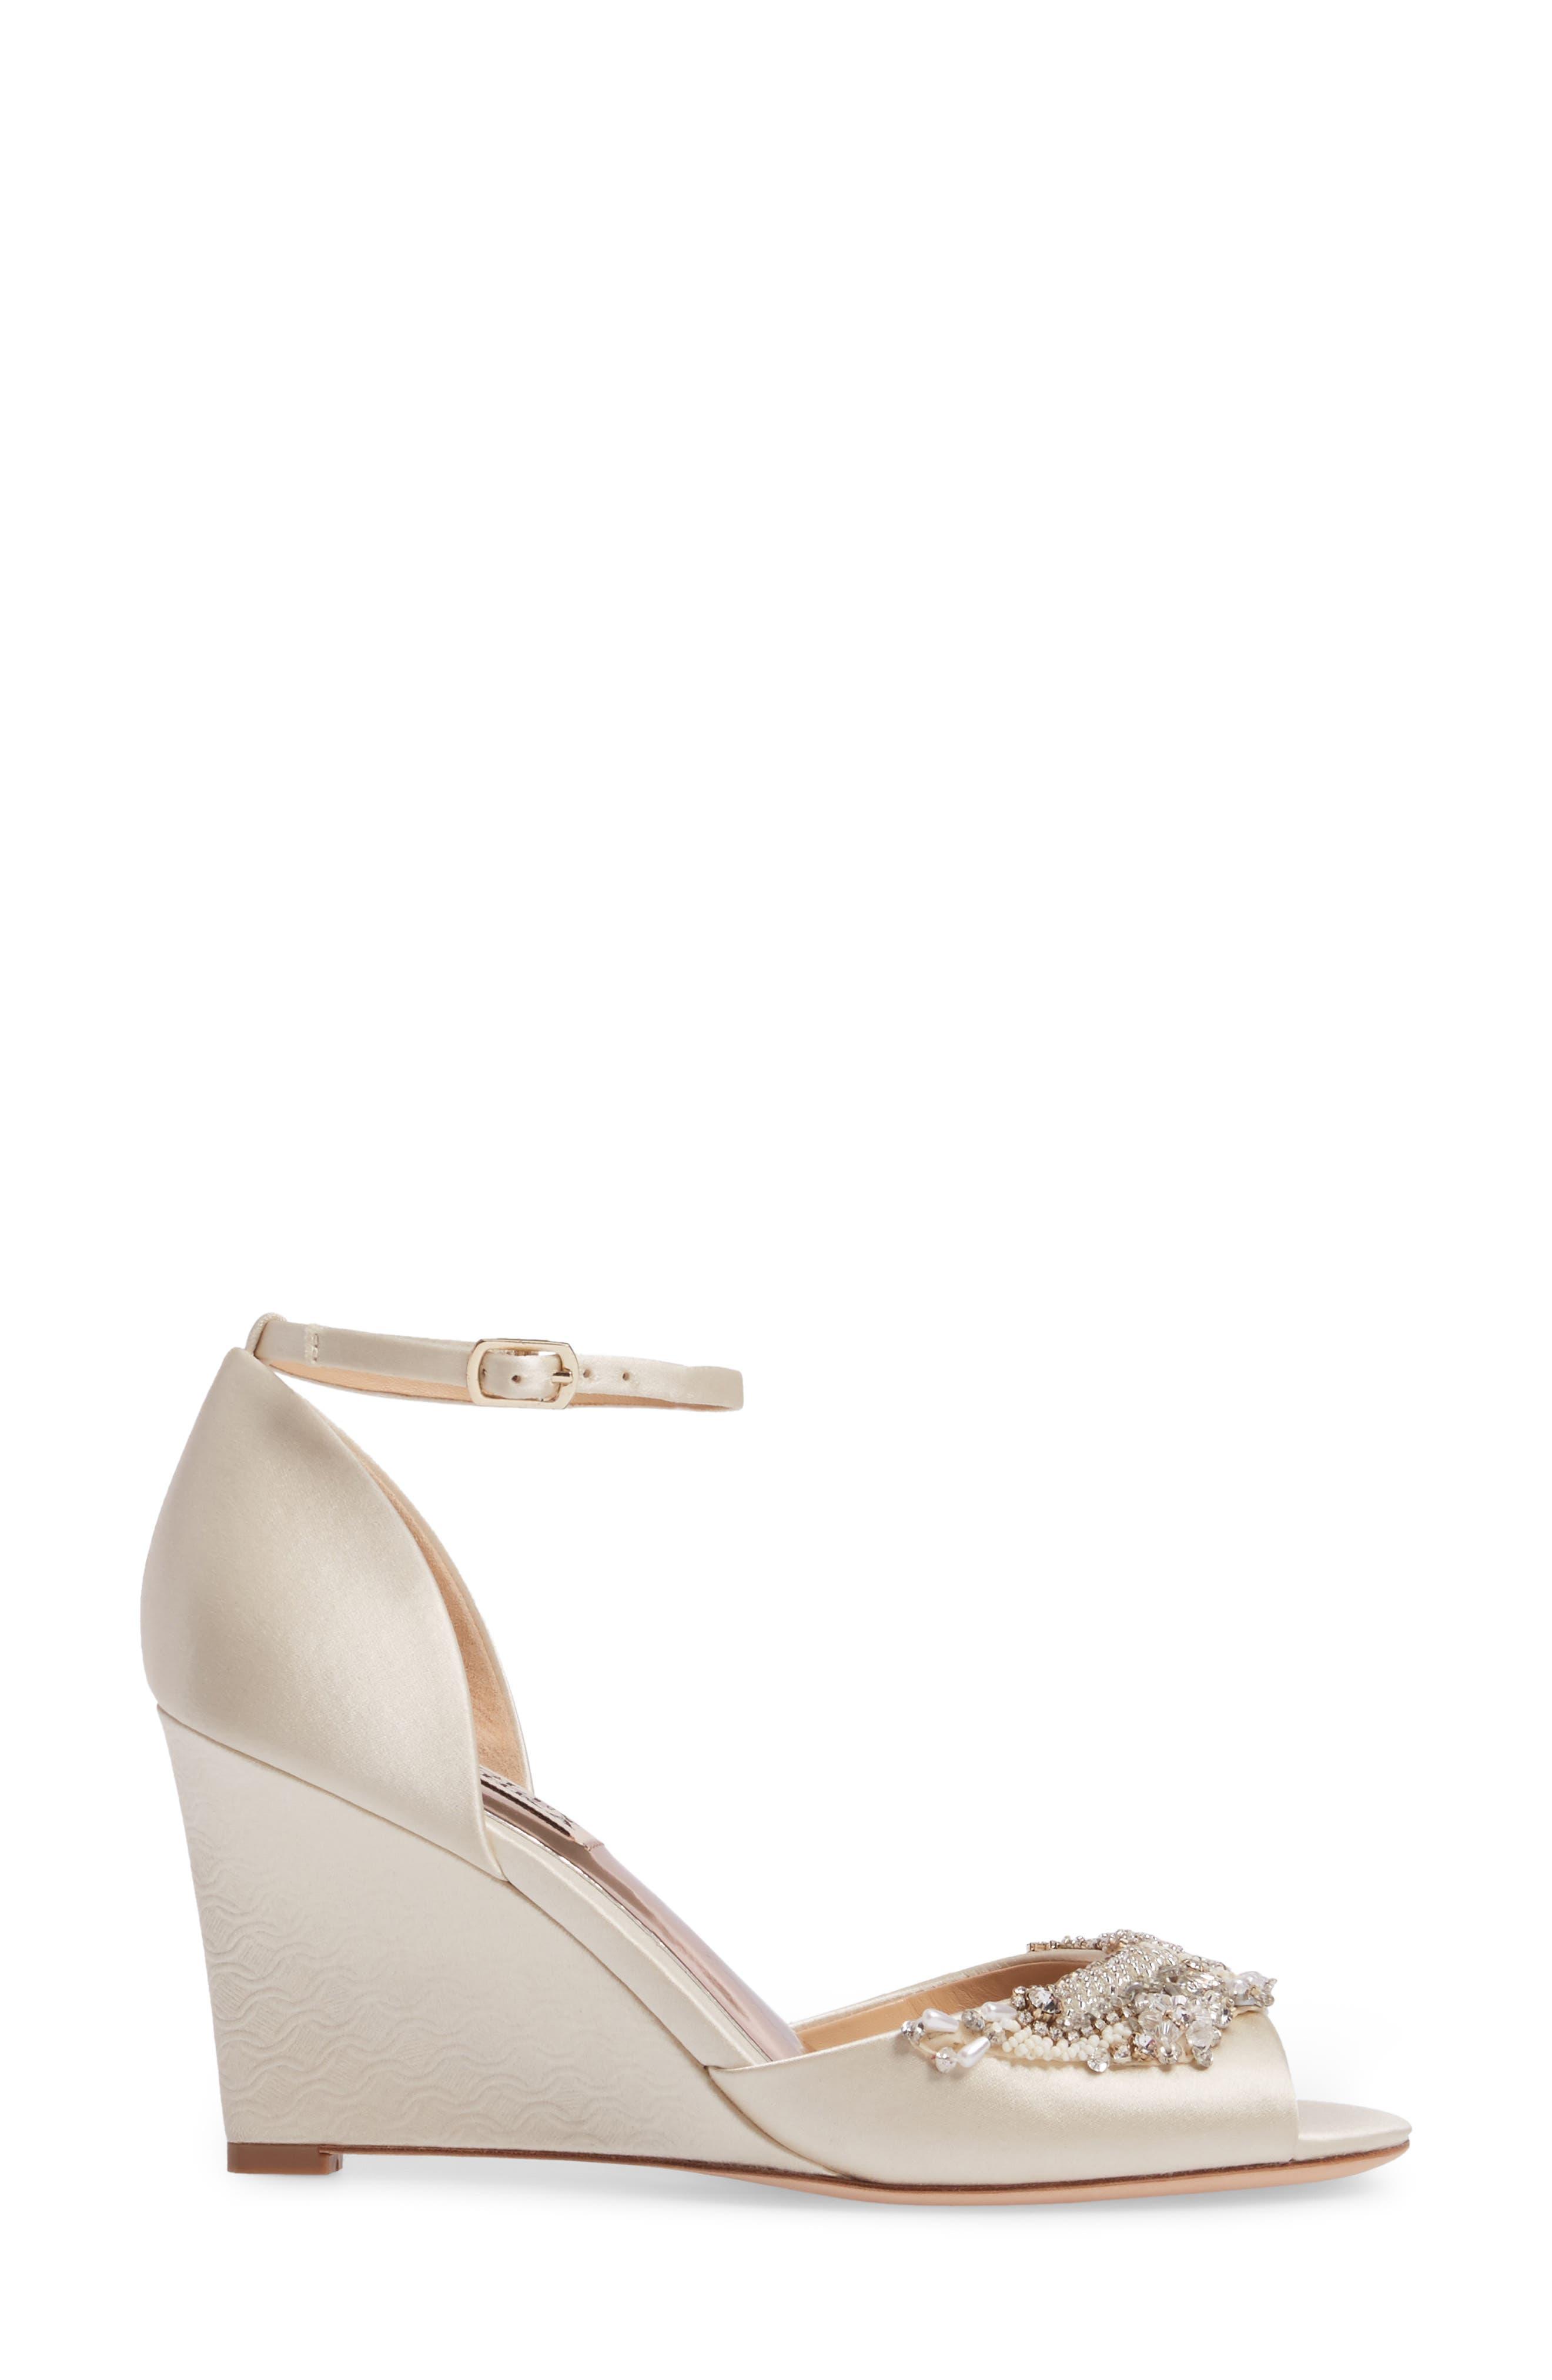 Malorie Embellished Sandal,                             Alternate thumbnail 6, color,